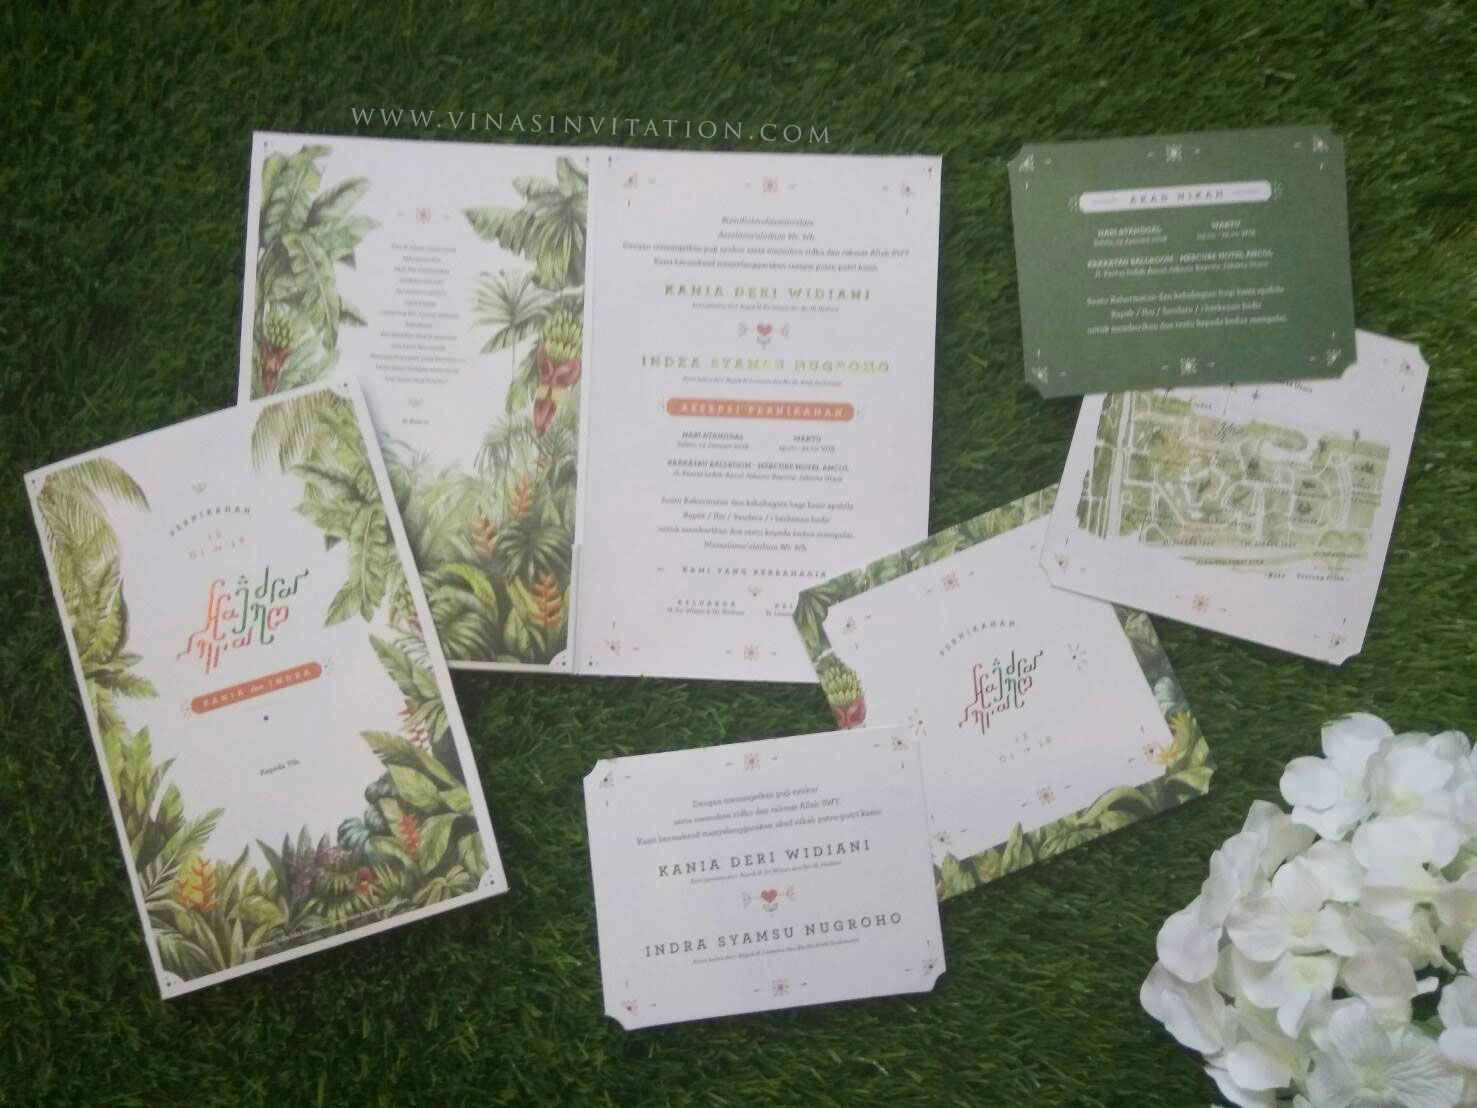 Vinas invitation. wedding invitation. bridestory. weddinginvitation ...